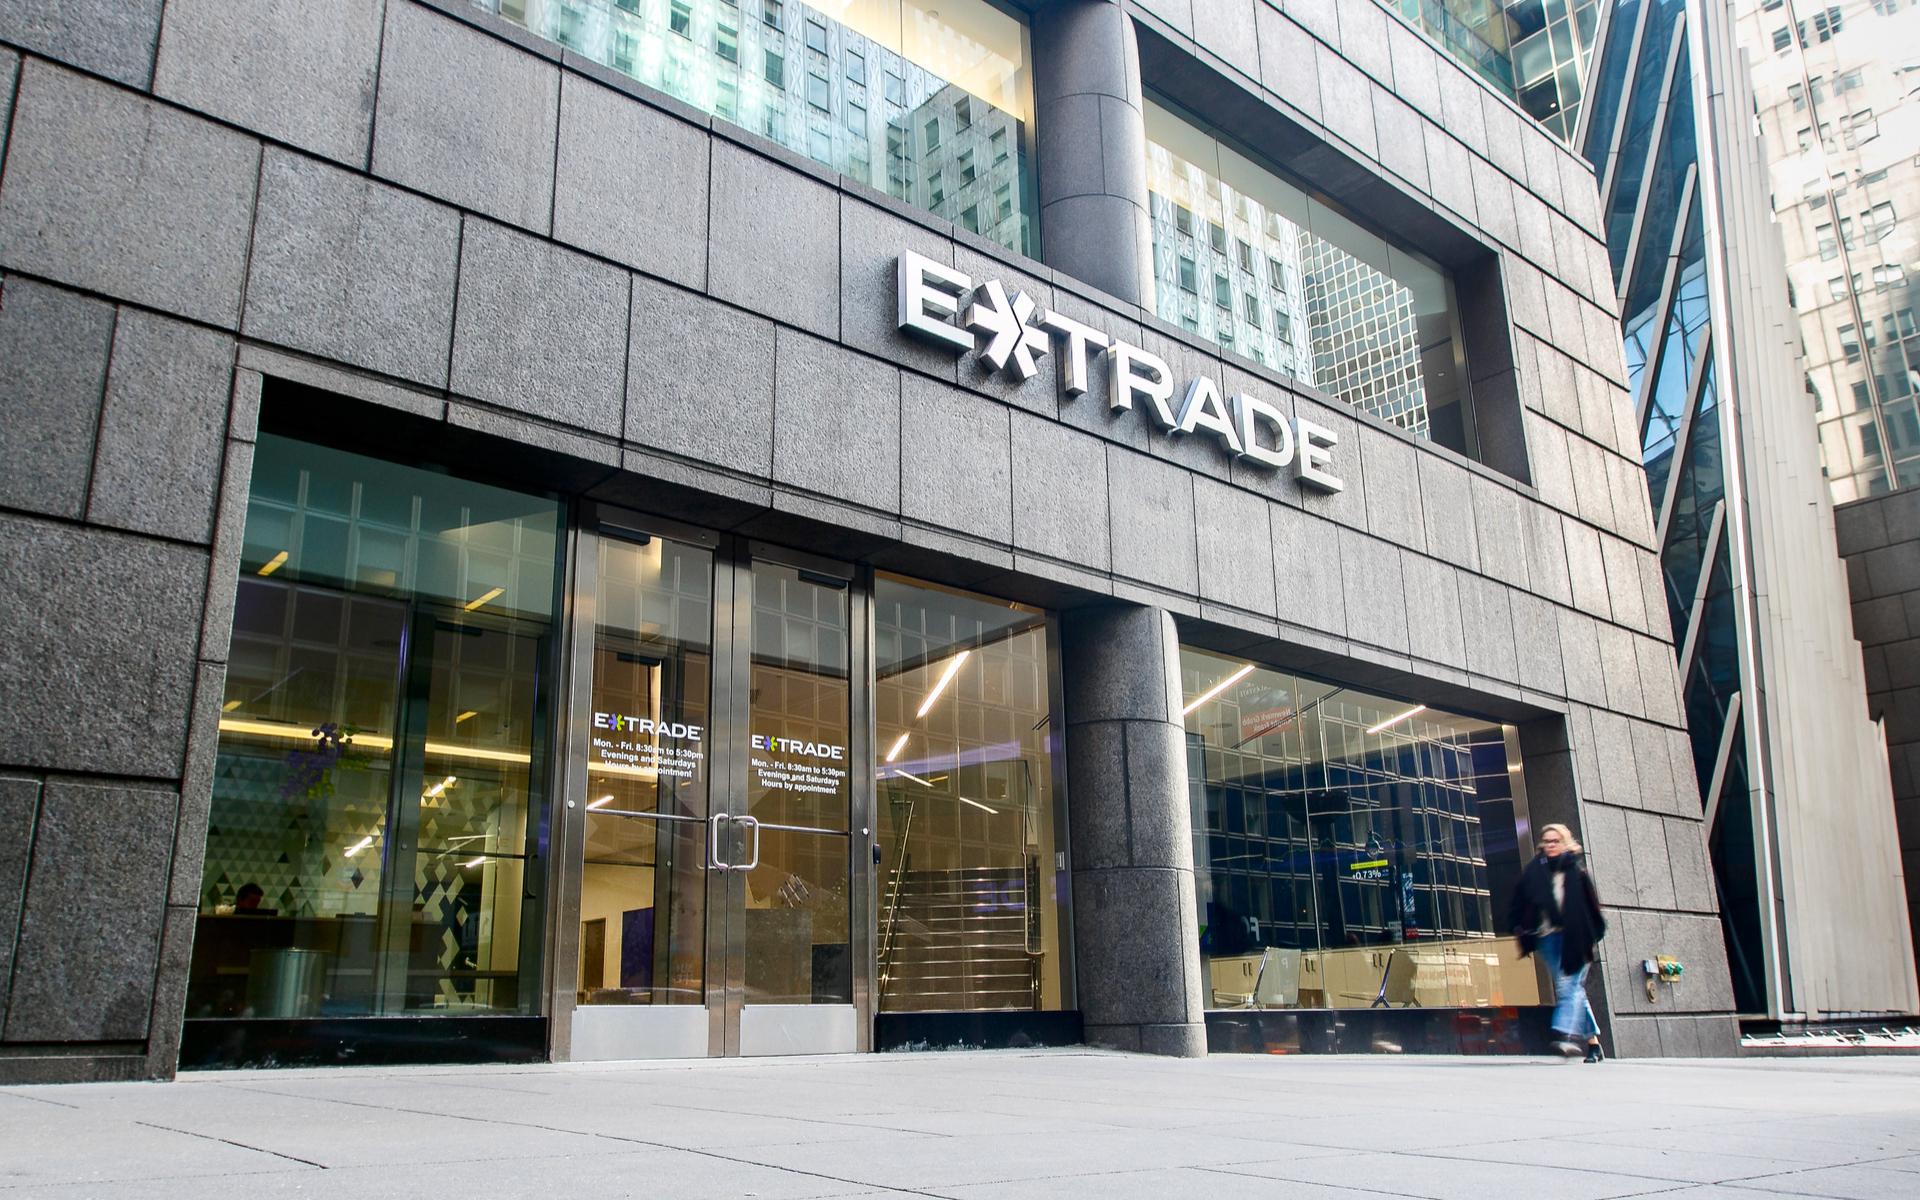 E-Trade